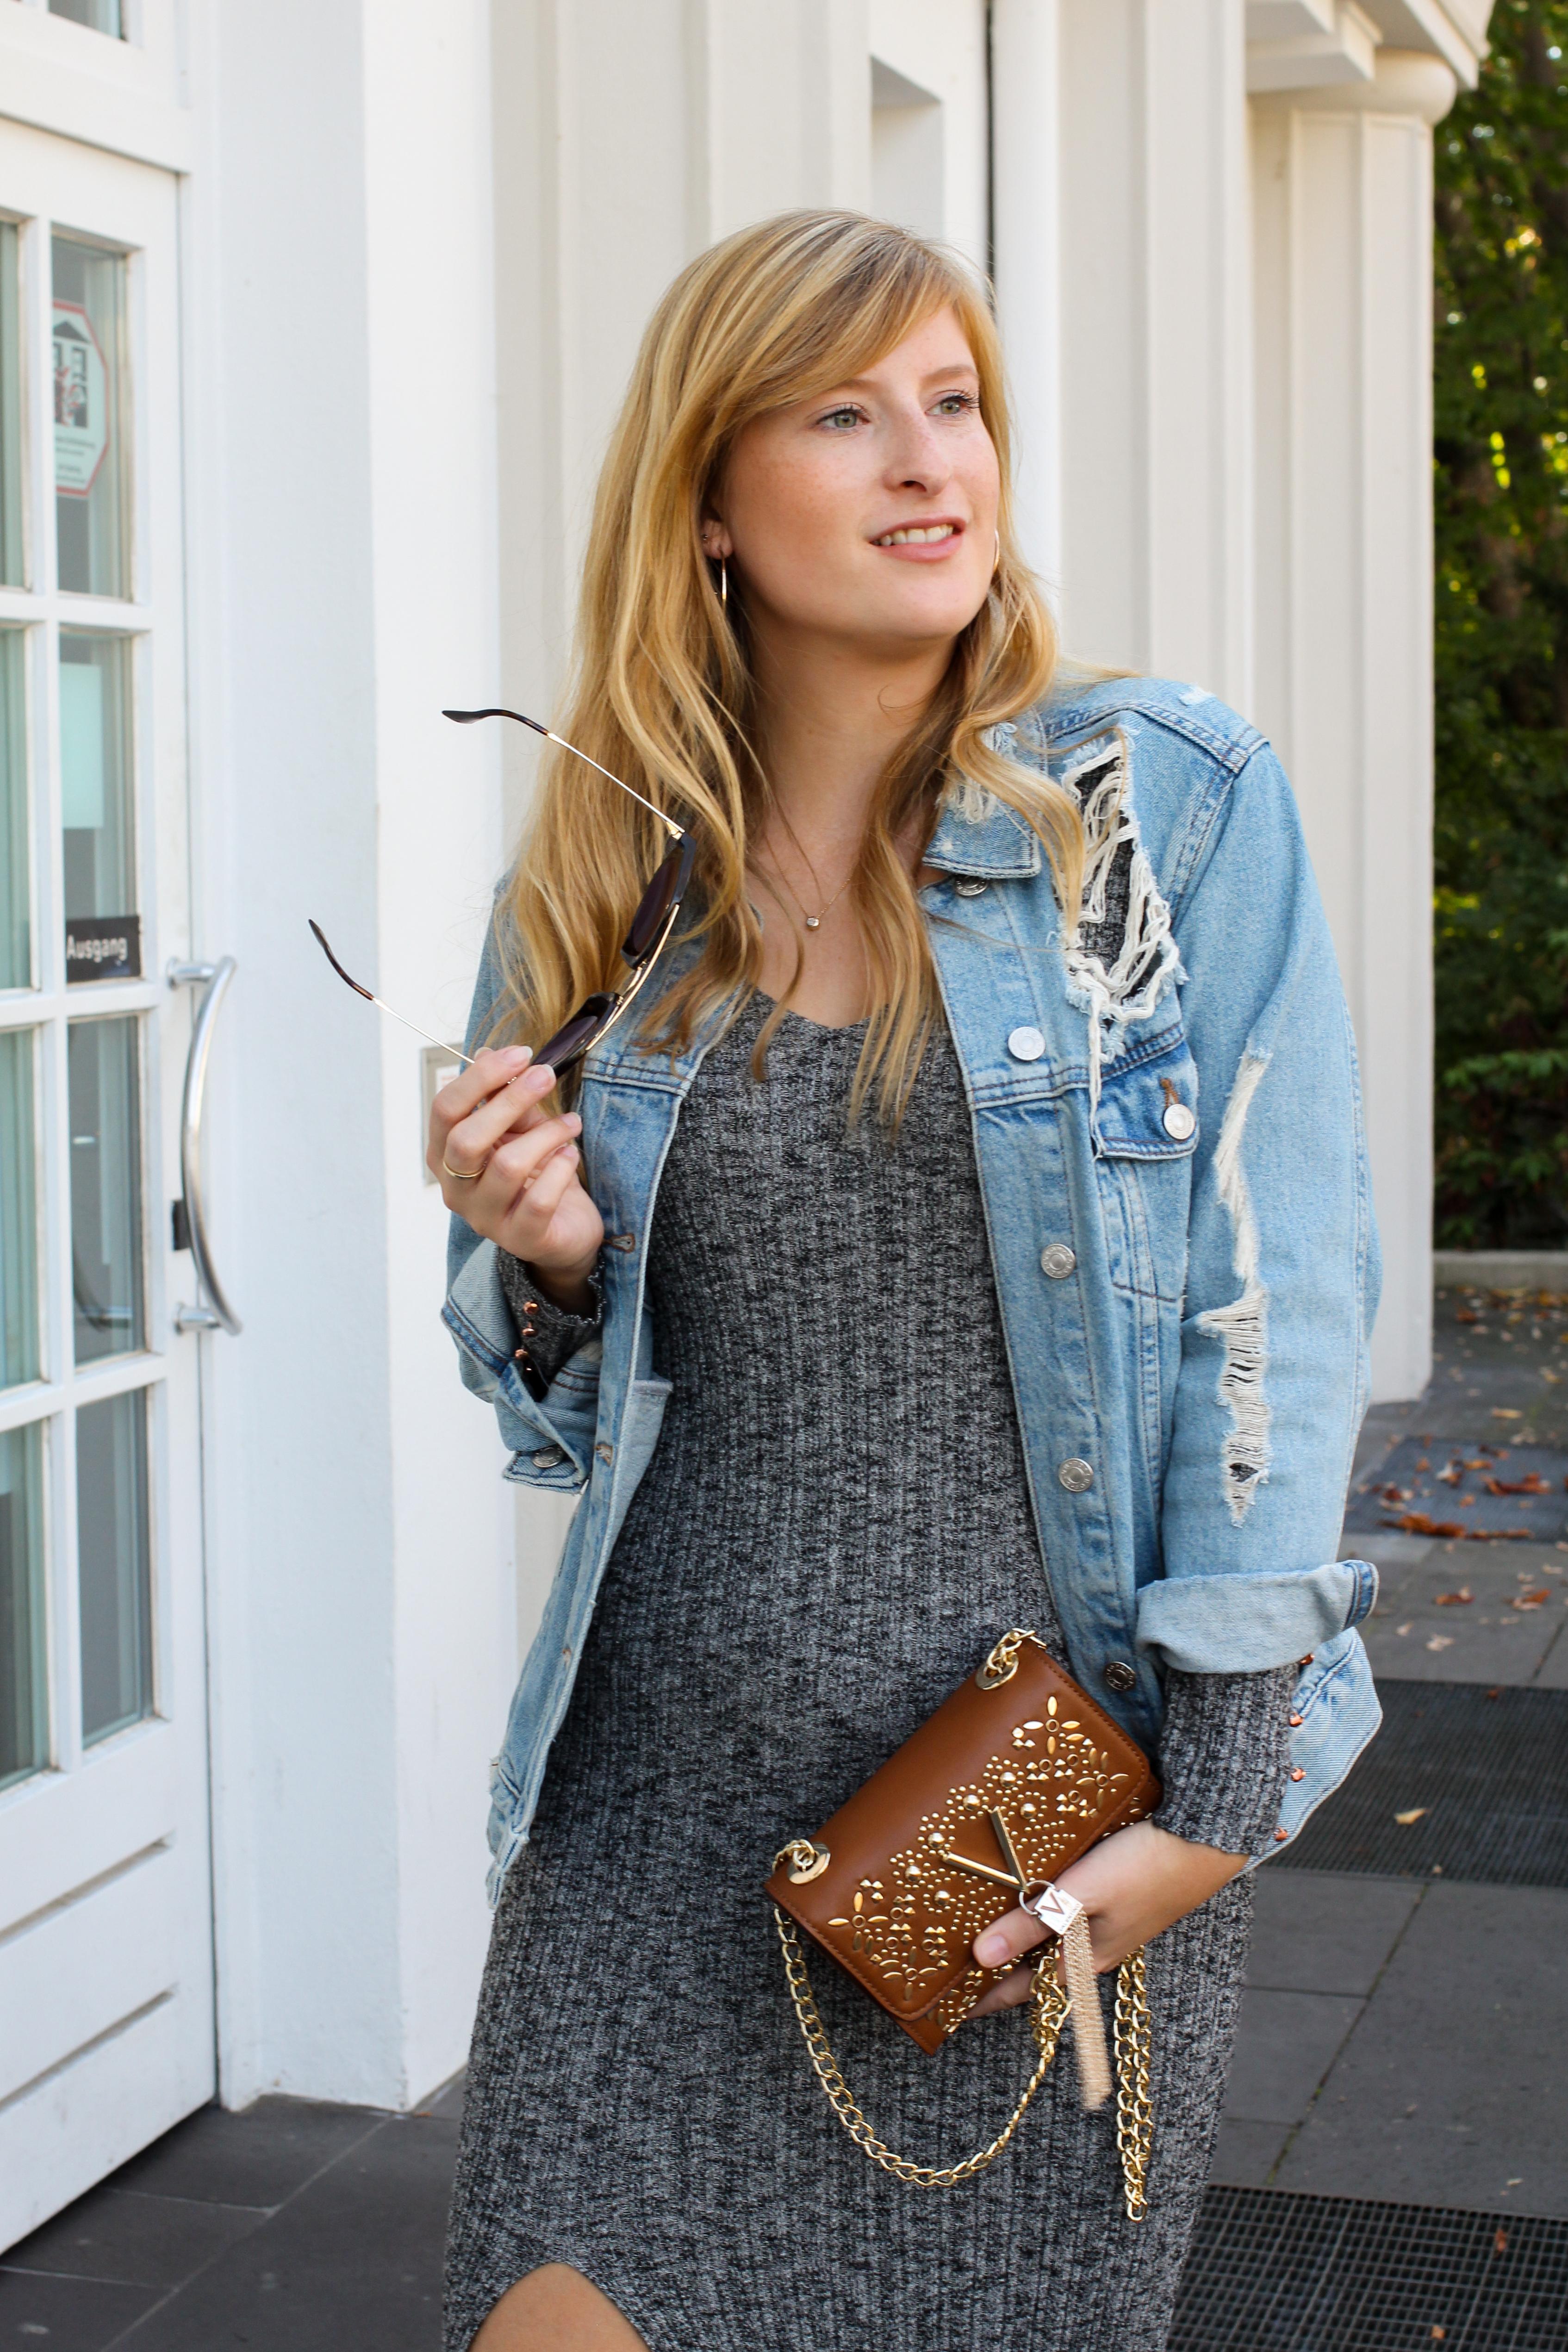 Herbstfavorit Wollkleid grau kombinieren Outfit Herbstlook Jeansjacke Valentino Handbags Fashion Blog Bonn Herbstoutfit 6